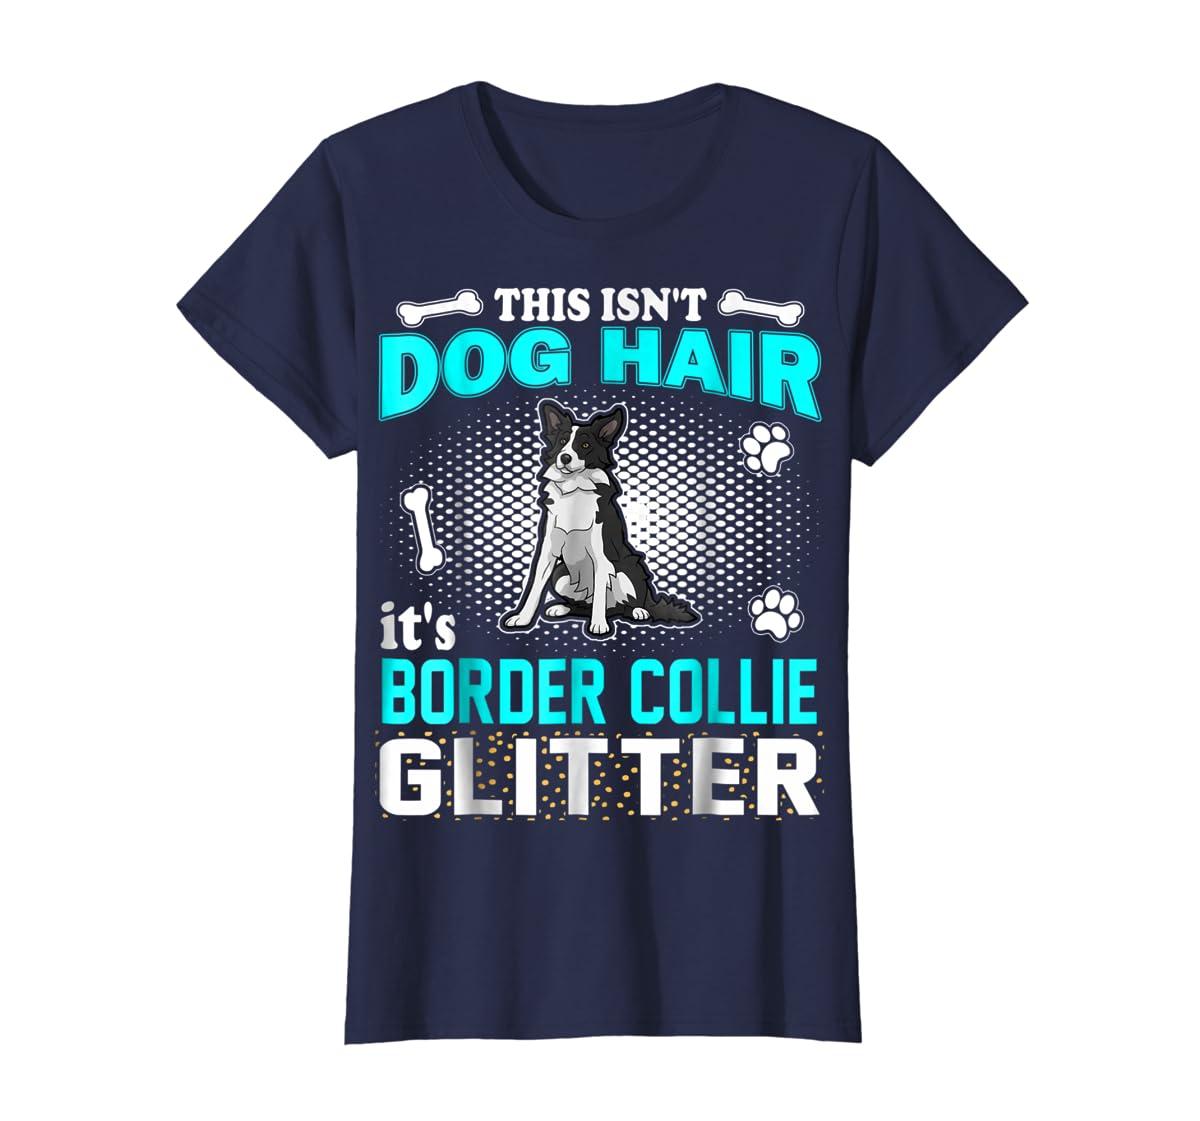 This Isn't Dog Hair It's Border Collie Glitter T-Shirt-Women's T-Shirt-Navy